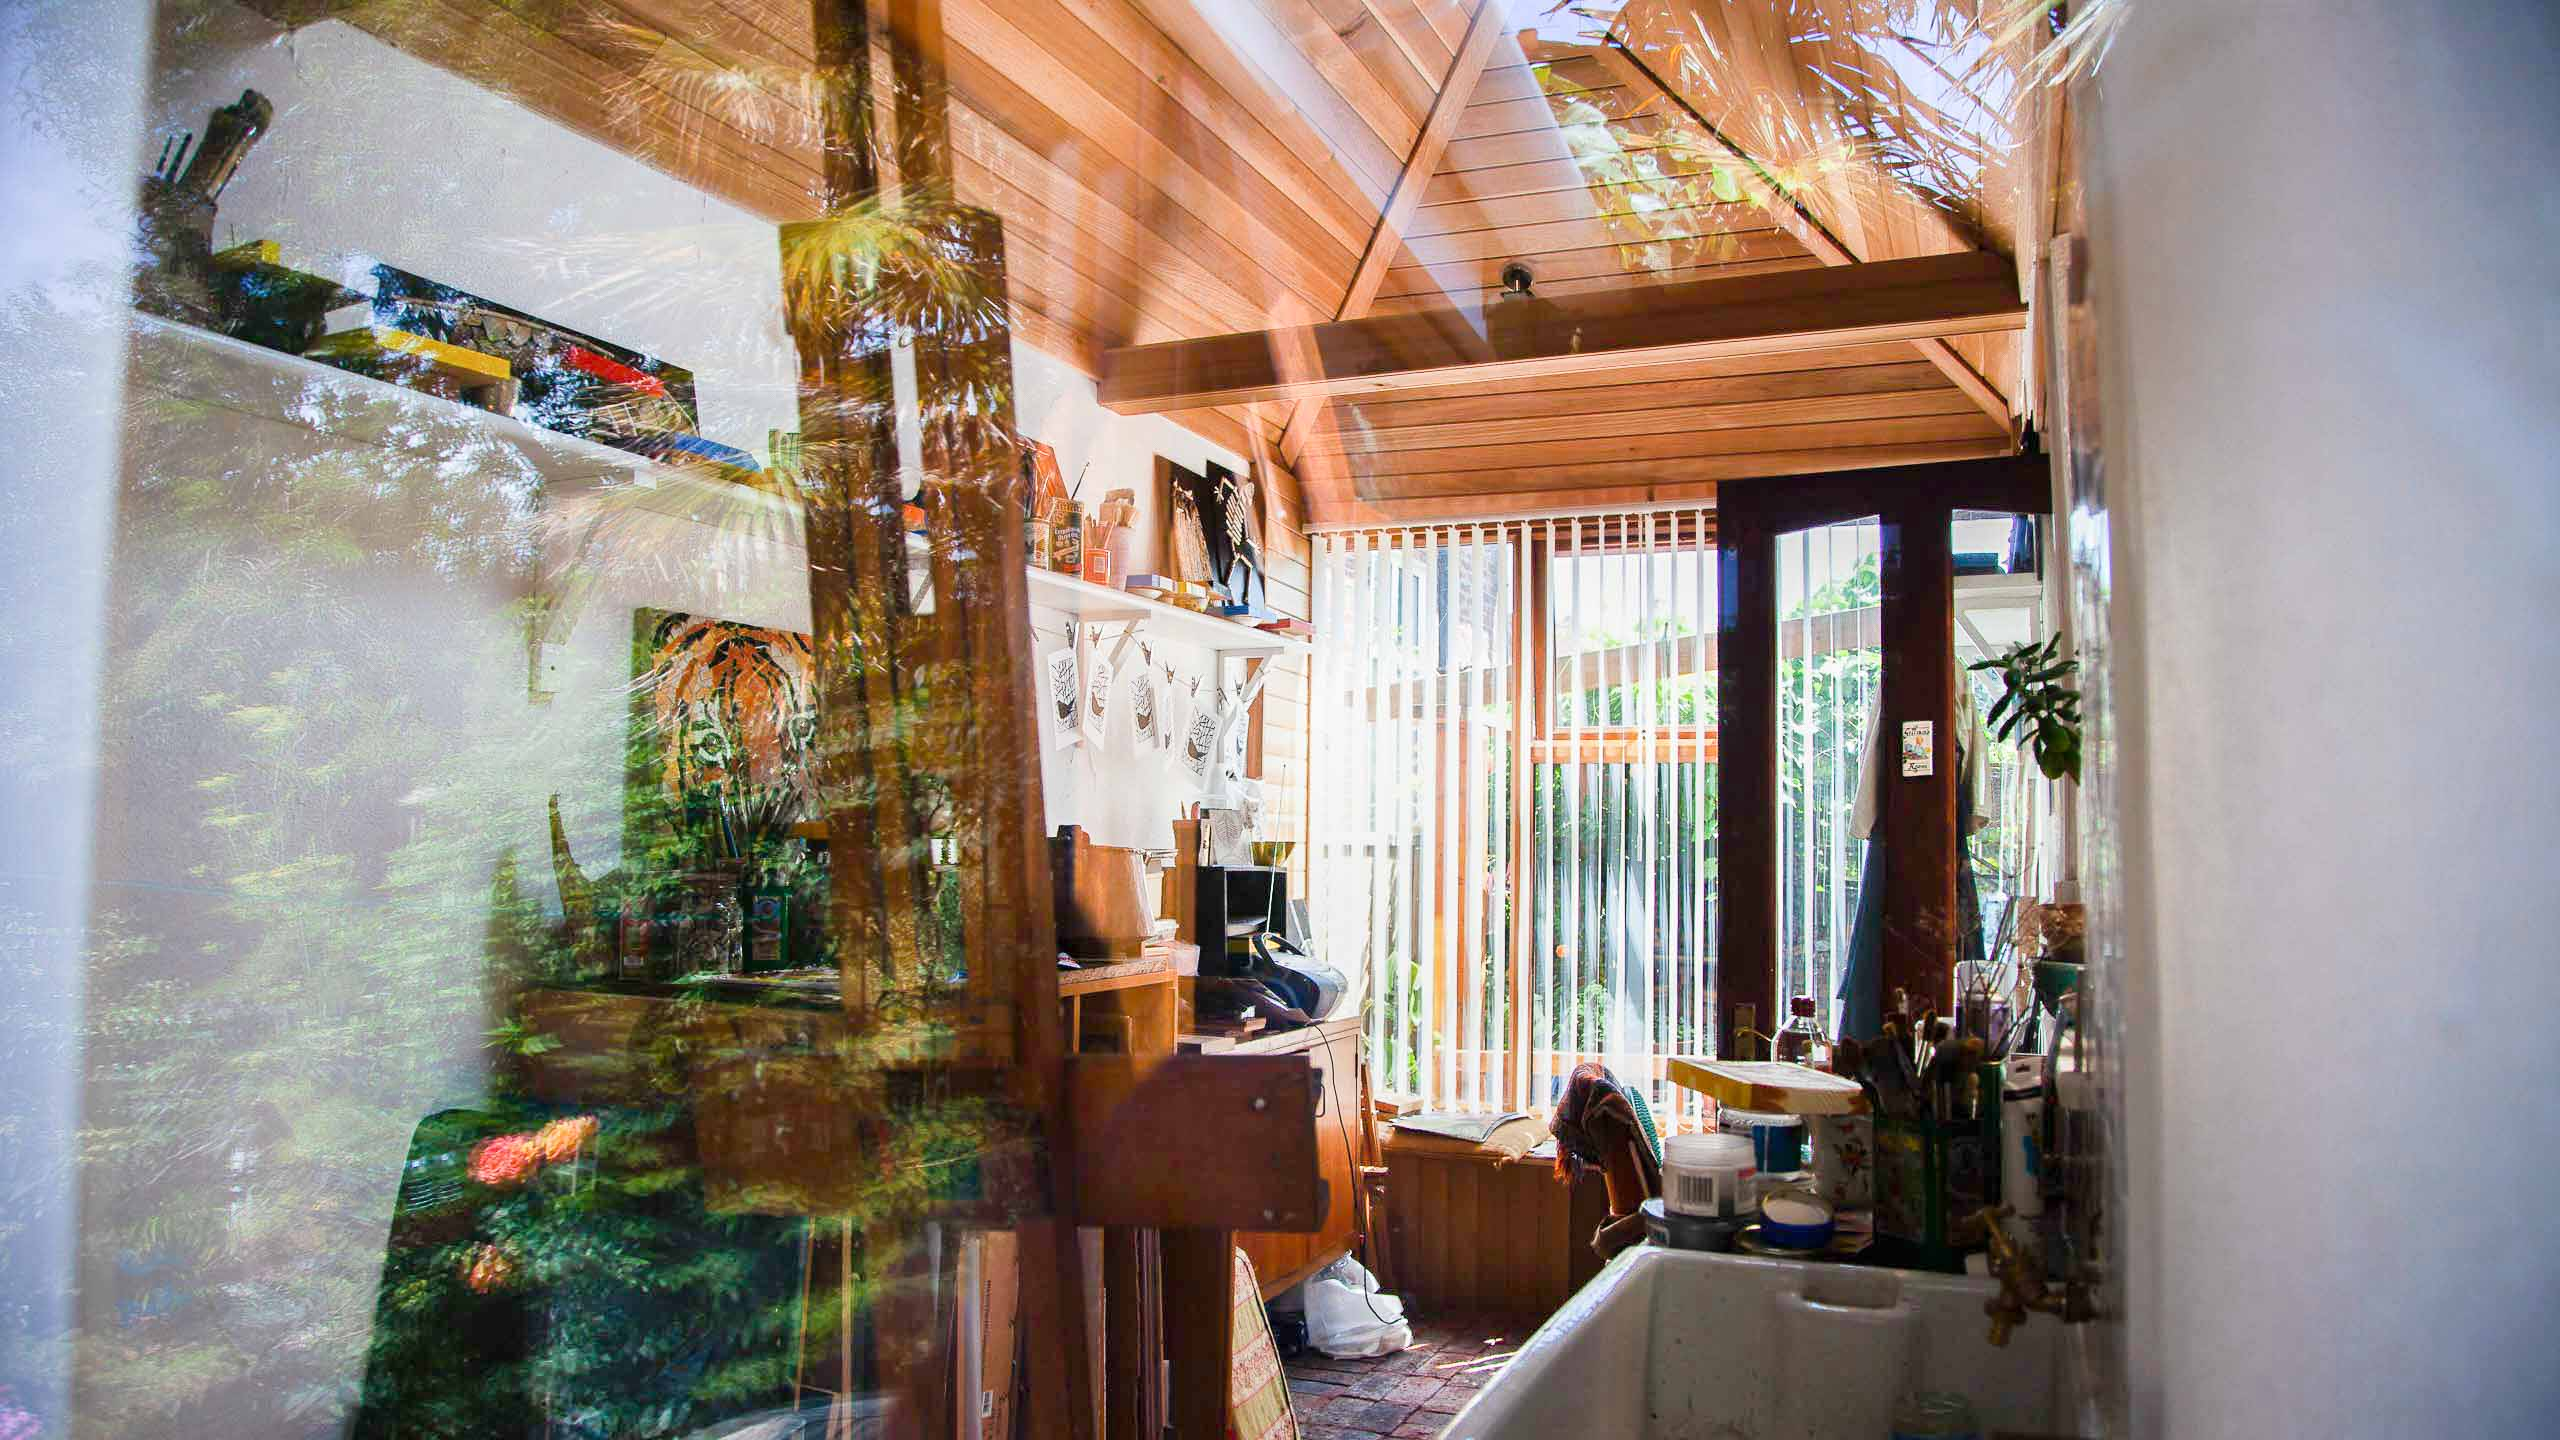 artist's studio garage conversion - building work by RJ Steele builders in Sussex